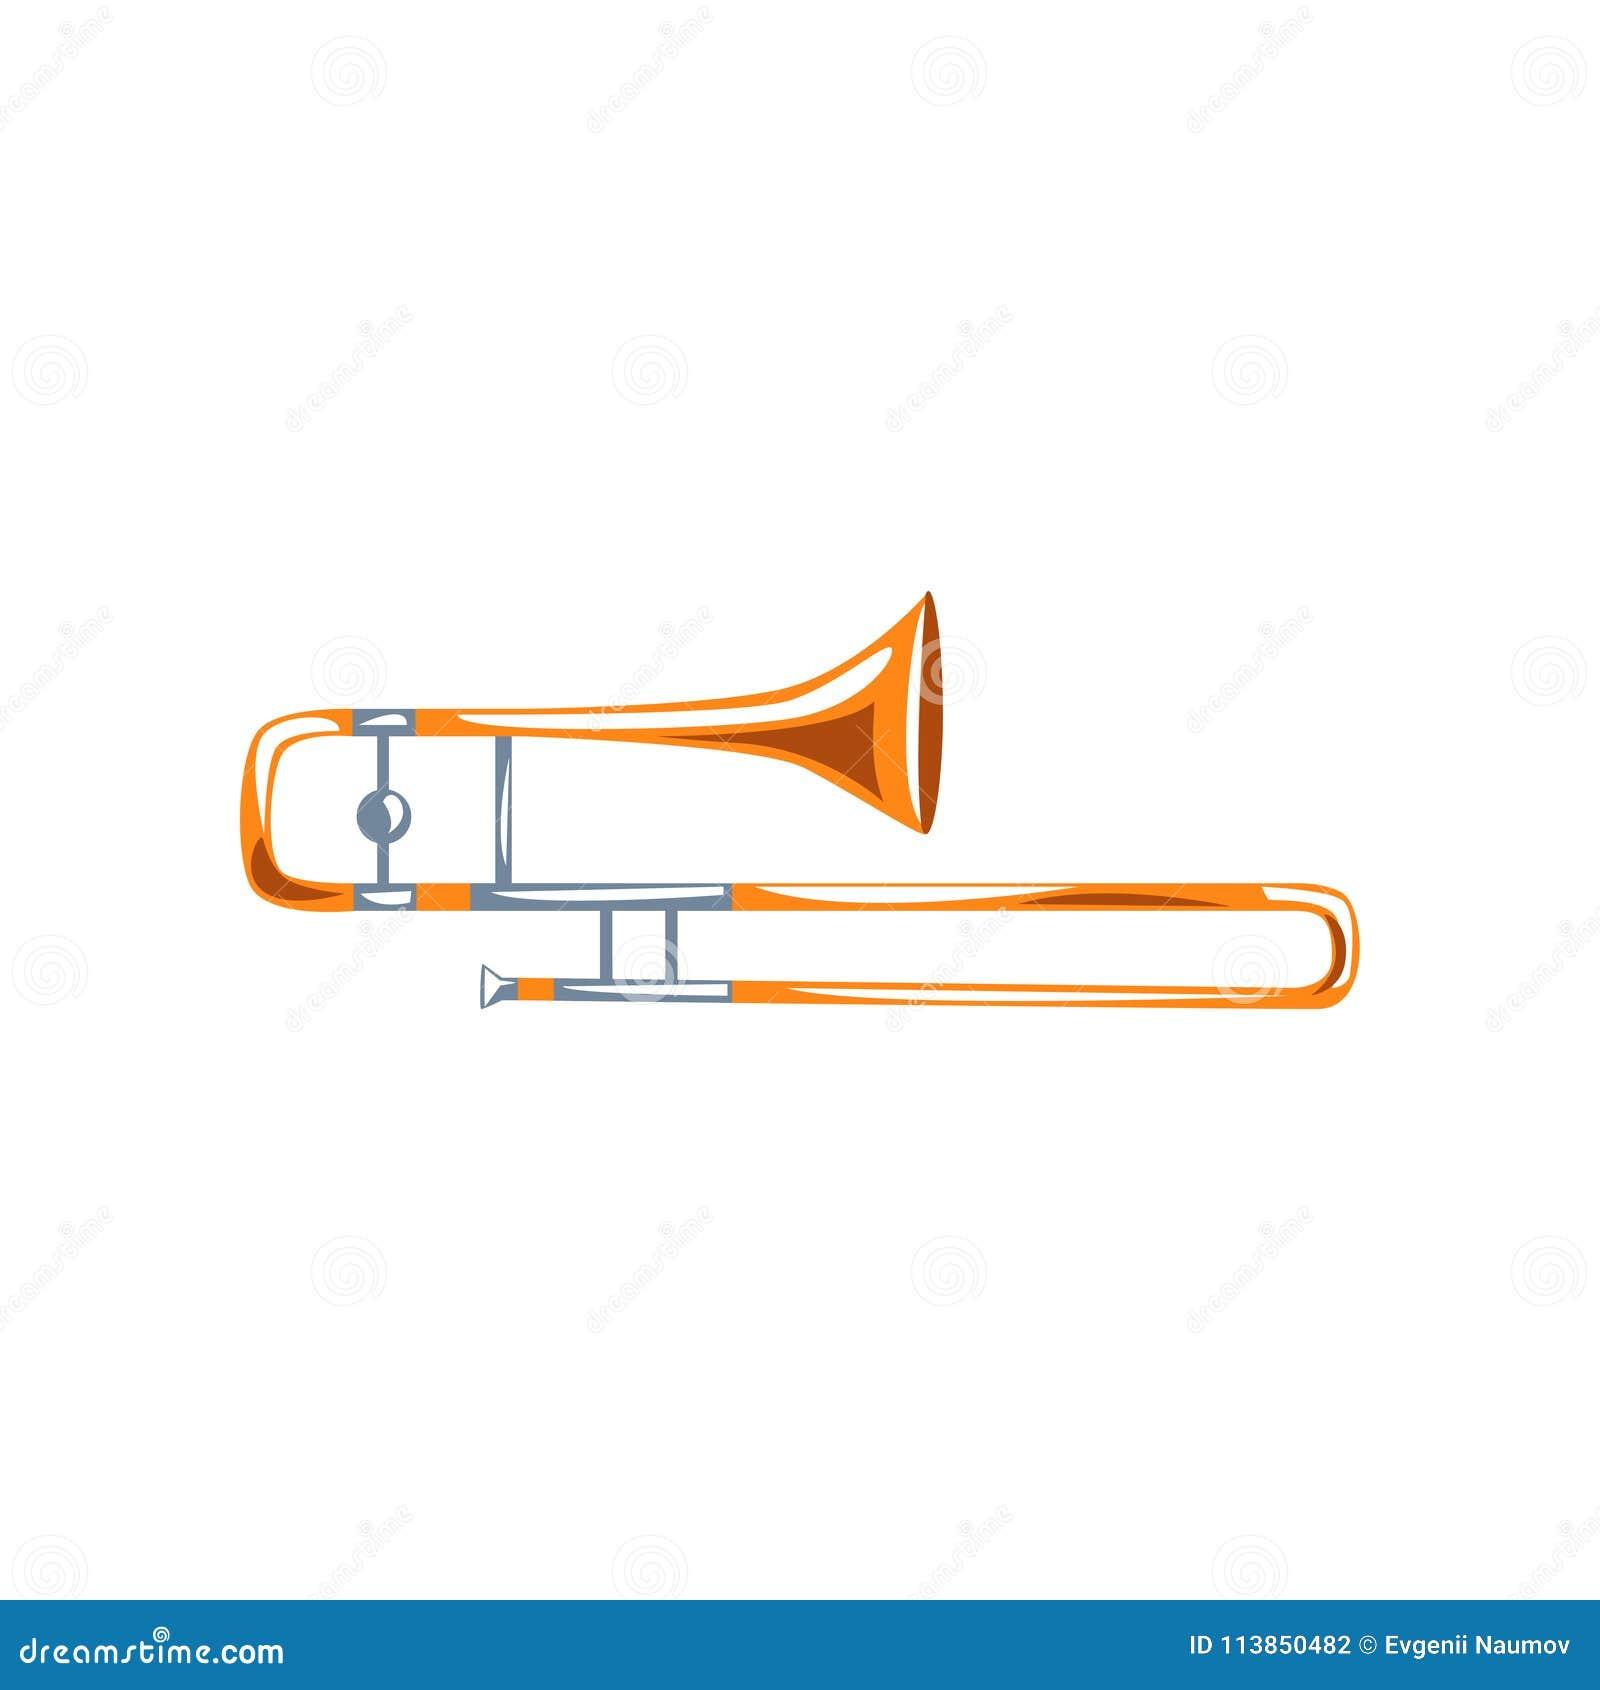 trombone classical music wind instrument vector illustration white background trombone classical music wind instrument vector 113850482 trombone, classical music wind instrument vector illustration on a